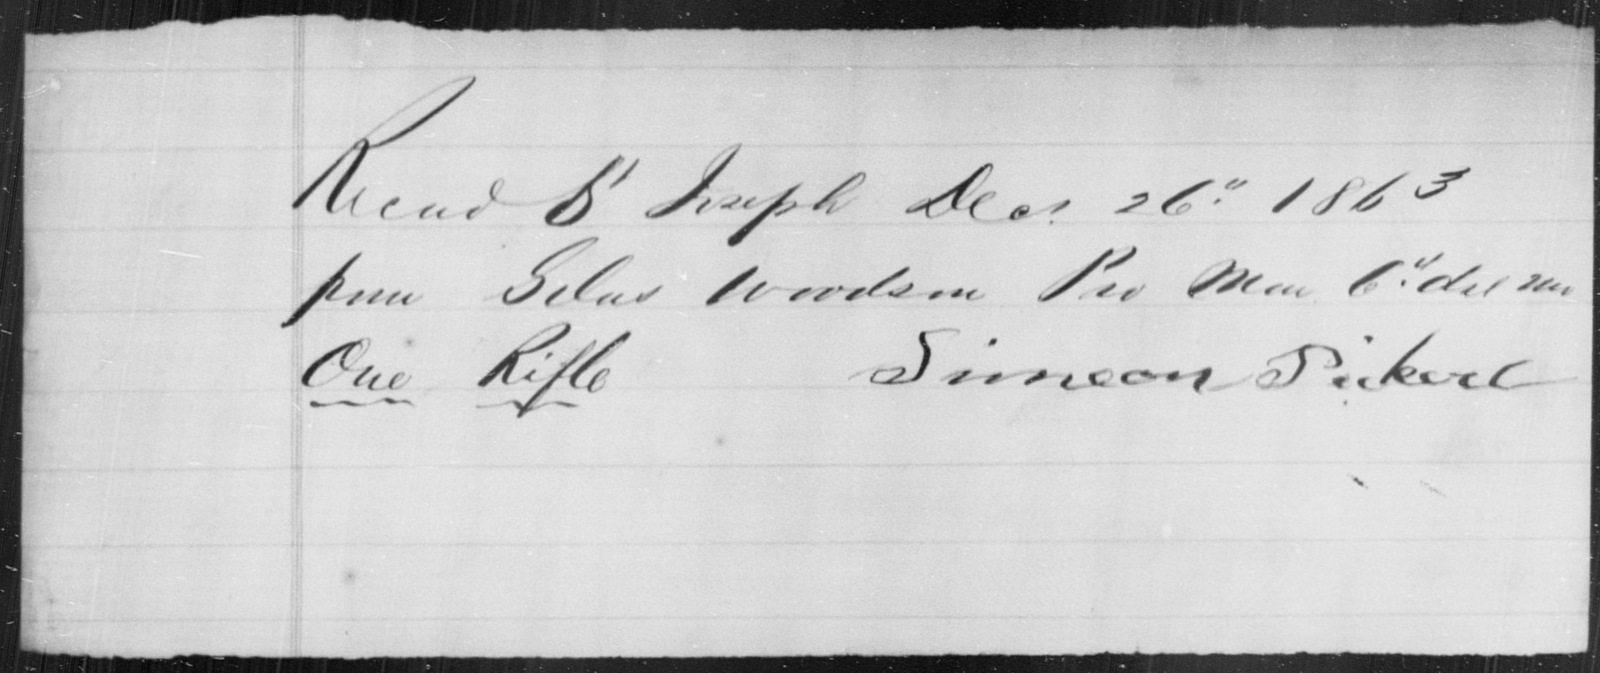 Pickett, Simeon - State: [Blank] - Year: 1863